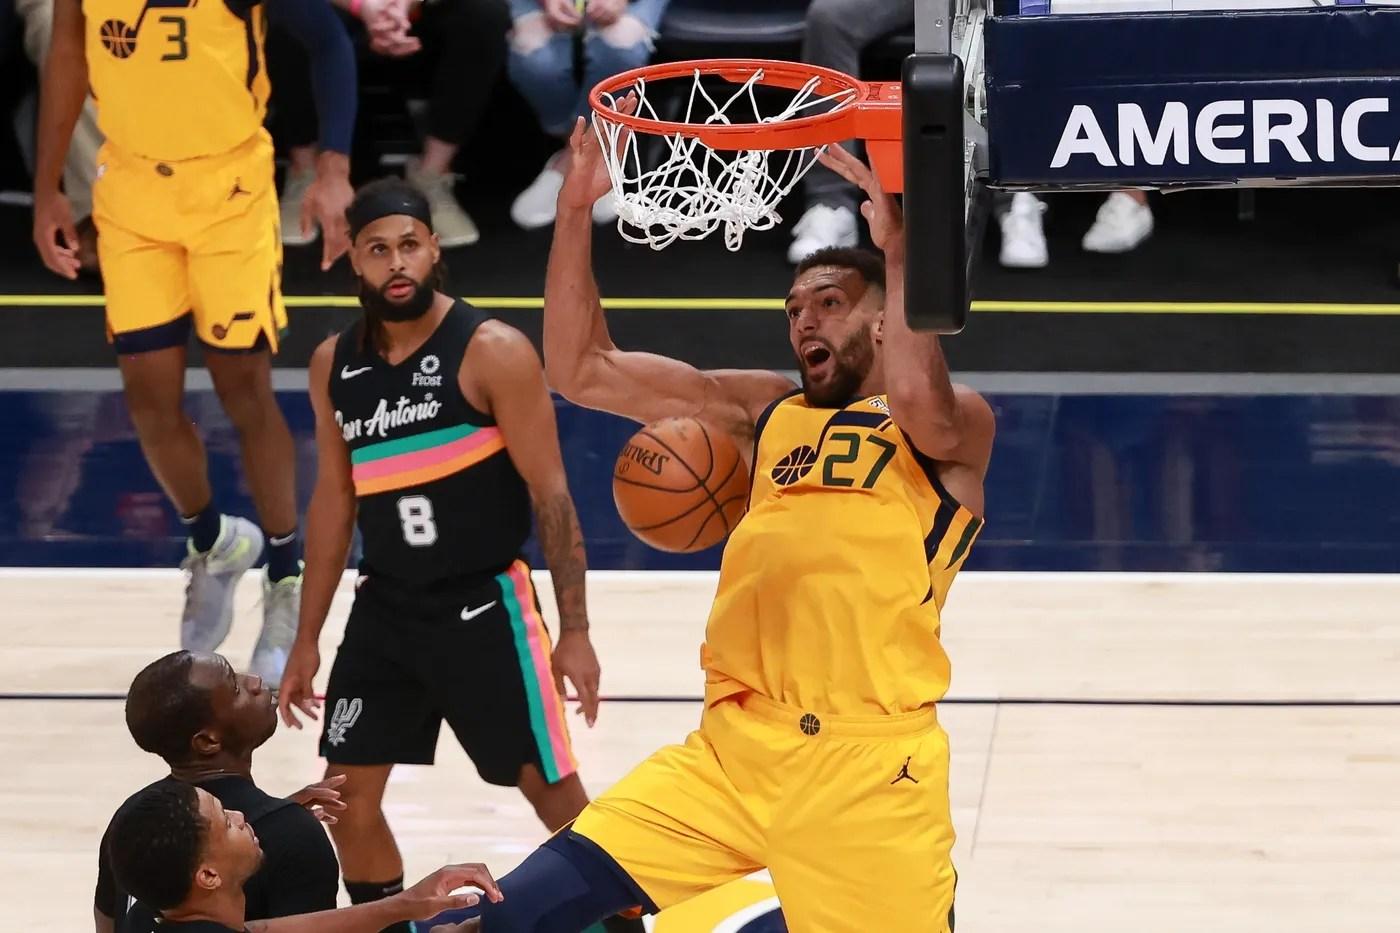 May 3, 2021; Salt Lake City, Utah, USA; Utah Jazz center Rudy Gobert (27) dunks the basketball during the fourth quarter against the San Antonio Spurs at Vivint Arena. Utah Jazz won 110-99. Mandatory Credit: Chris Nicoll-USA TODAY Sports